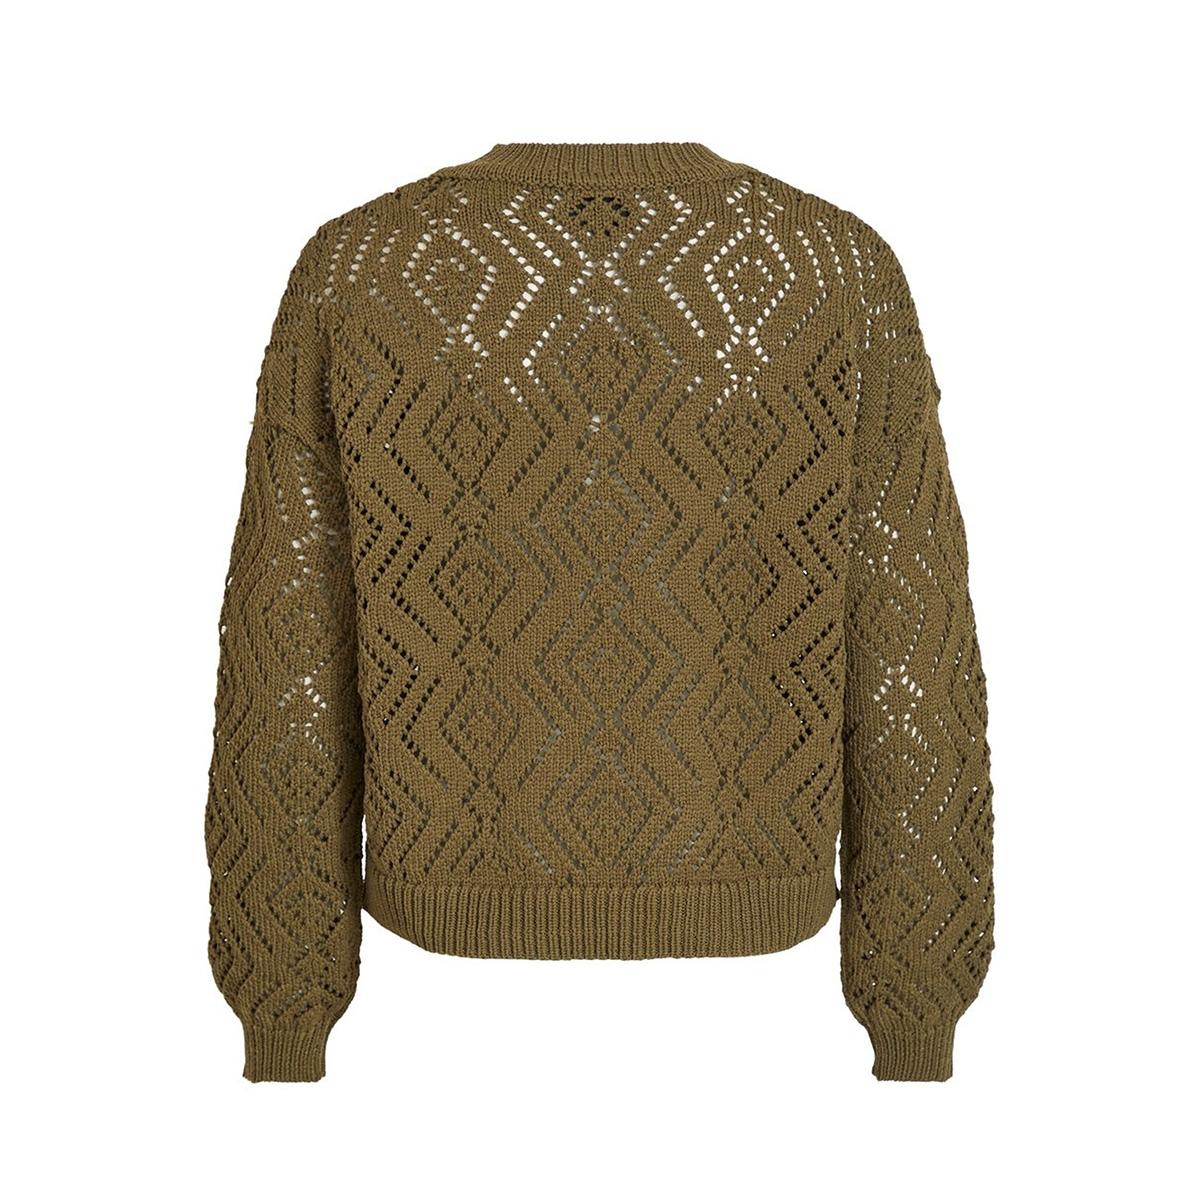 objsophia l/s knit pullover 107 23031542 object trui burnt olive